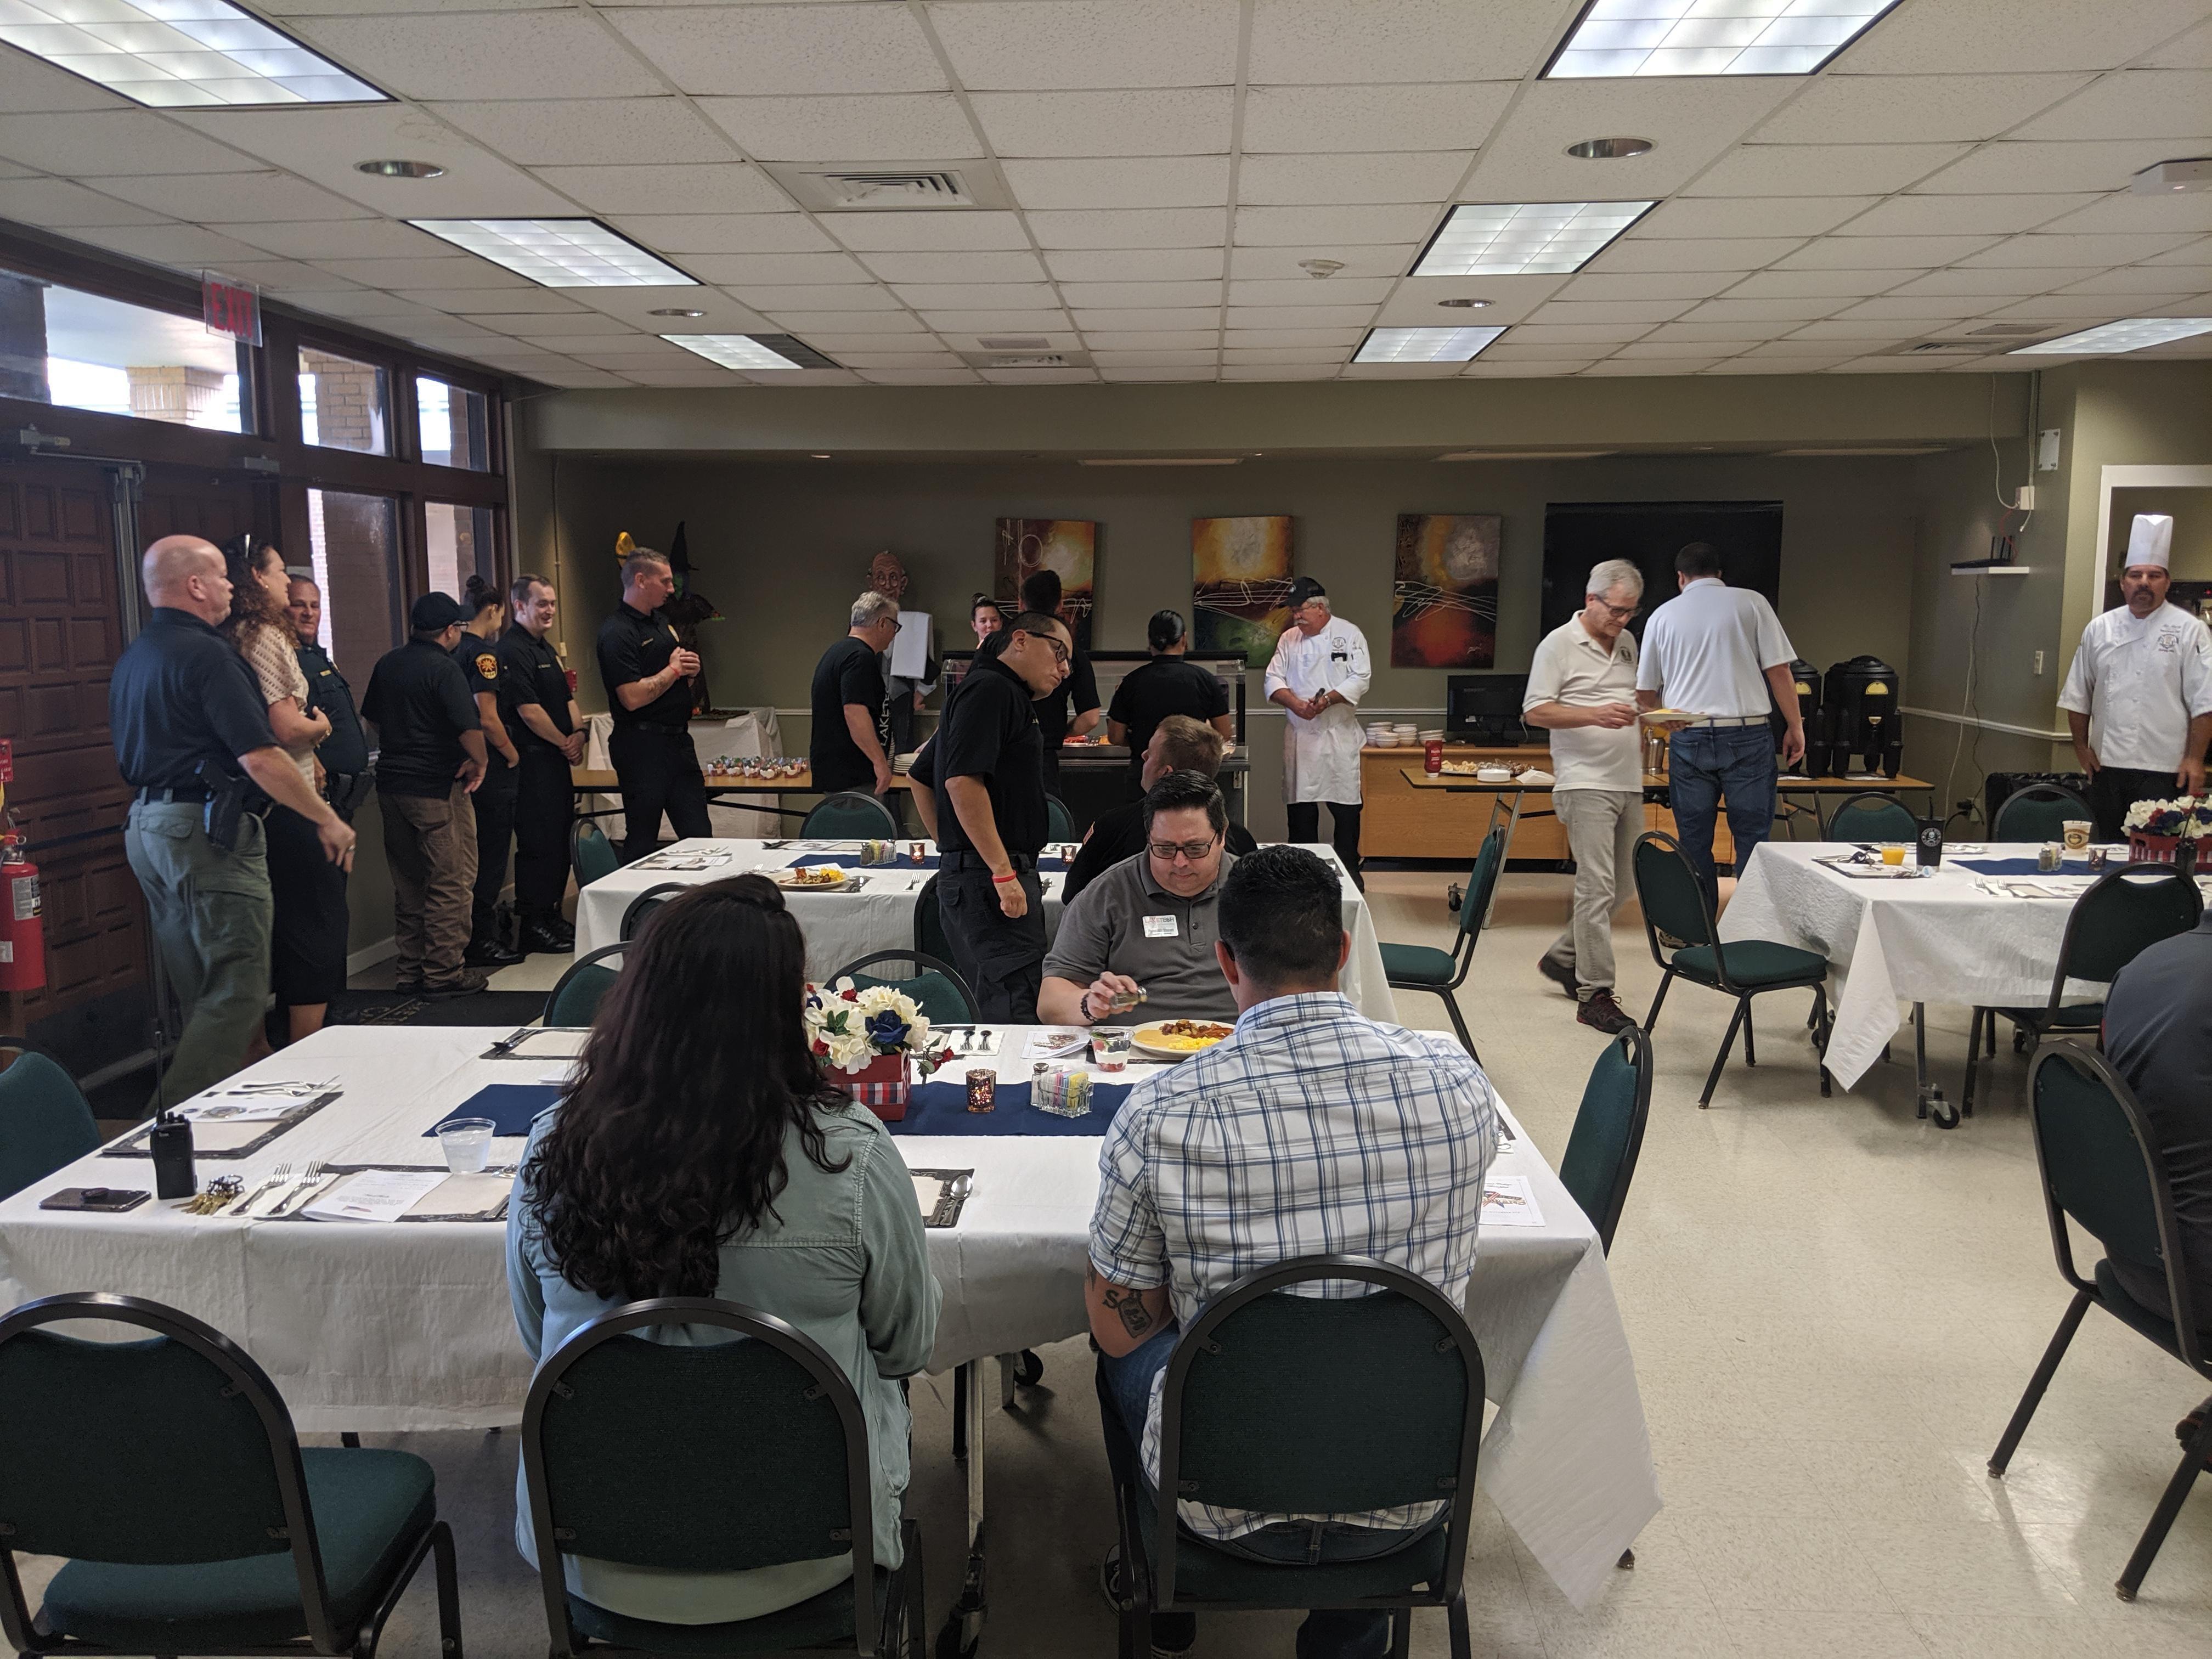 Veterans Breakfast13 110819 Student Affairs 11/08/19